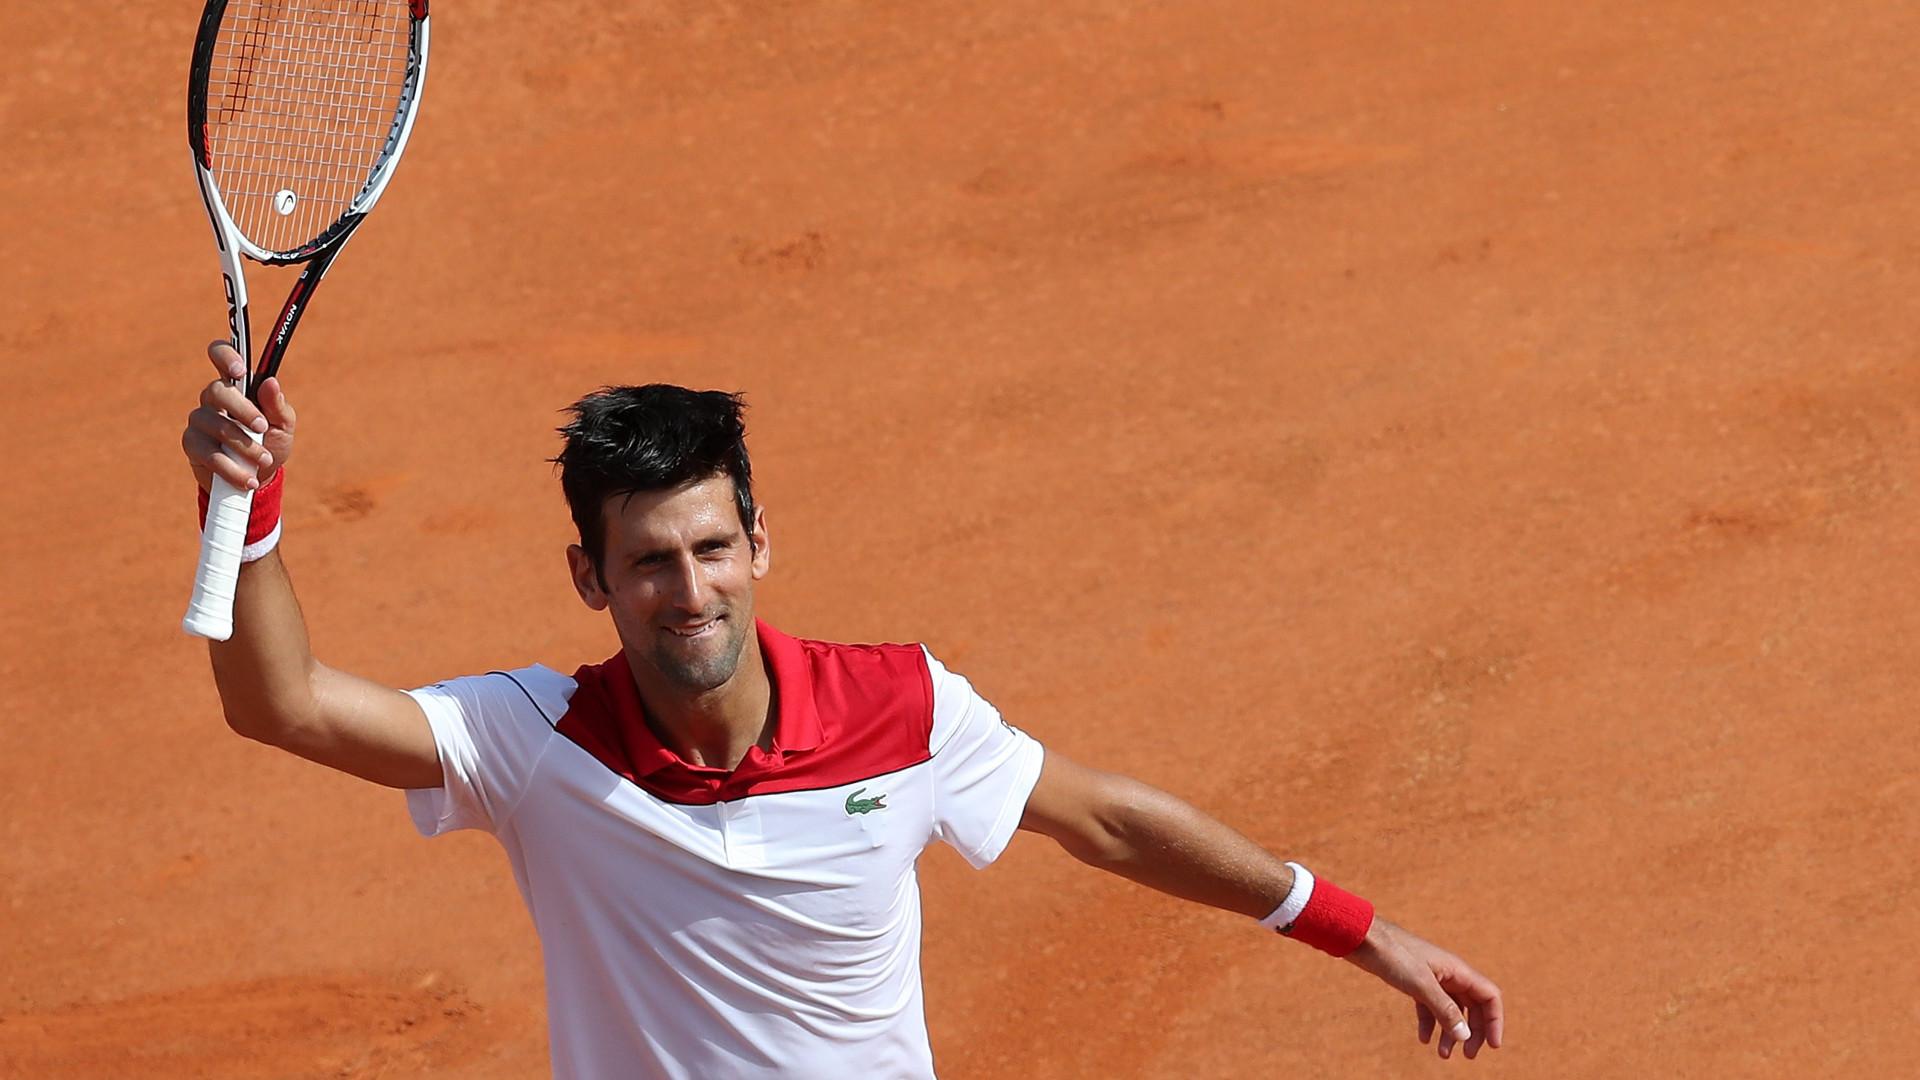 Djokovic regressa às vitórias três meses depois